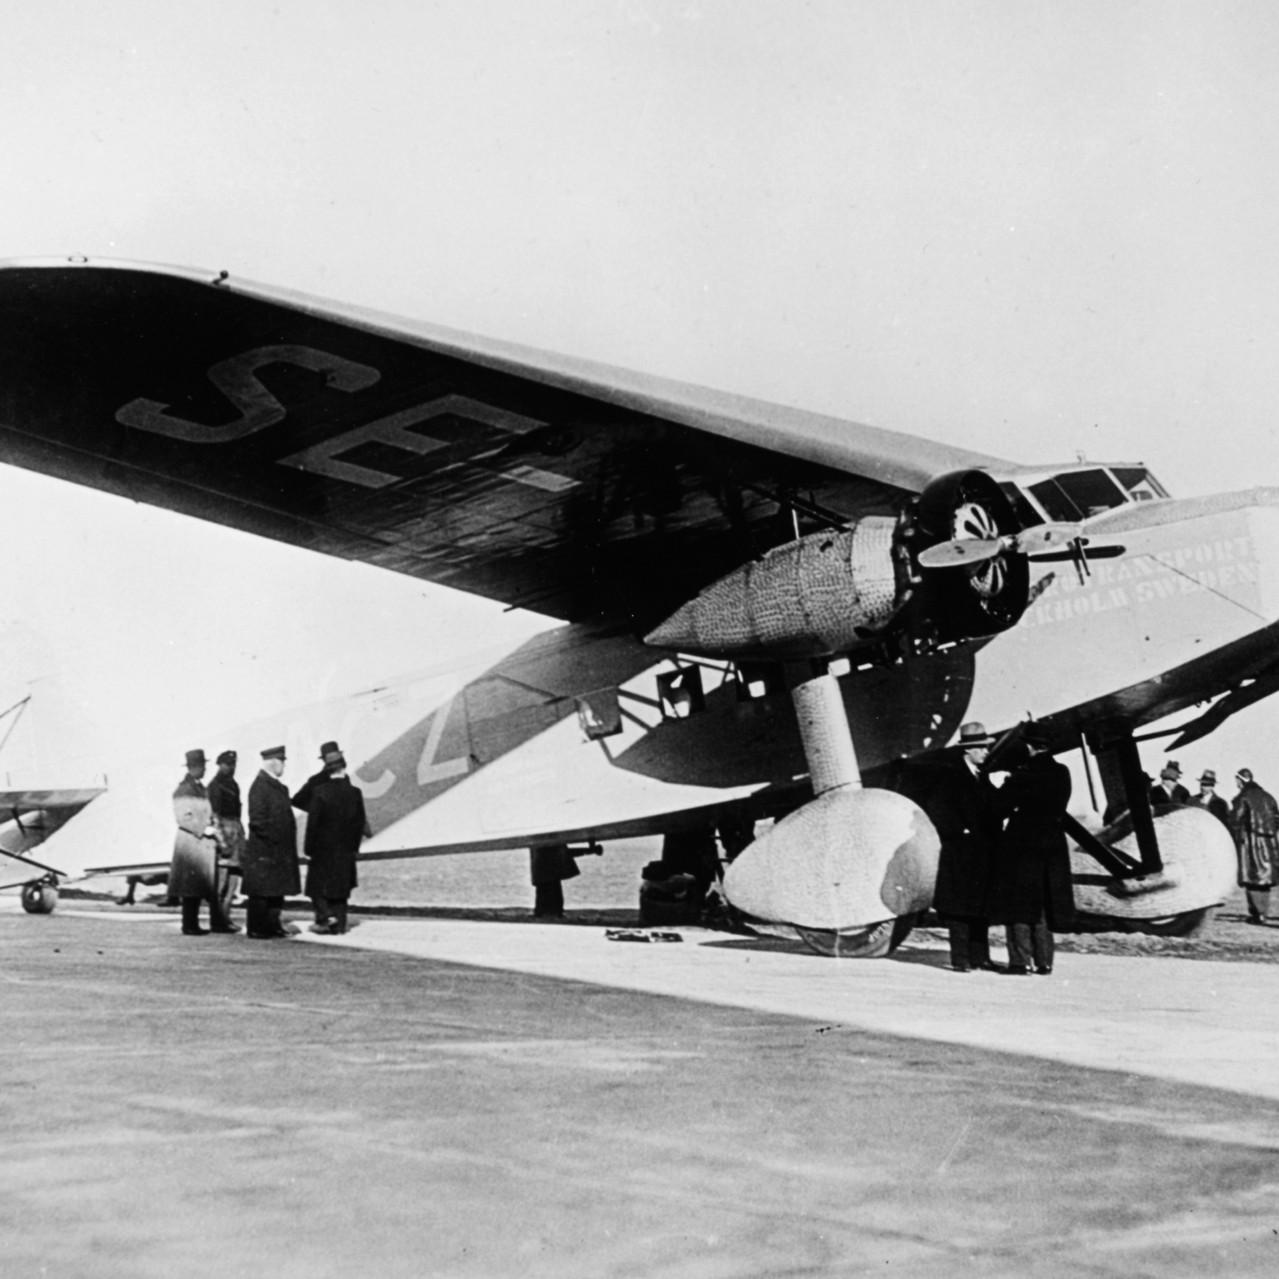 001_1940s_F-12_image-SAS